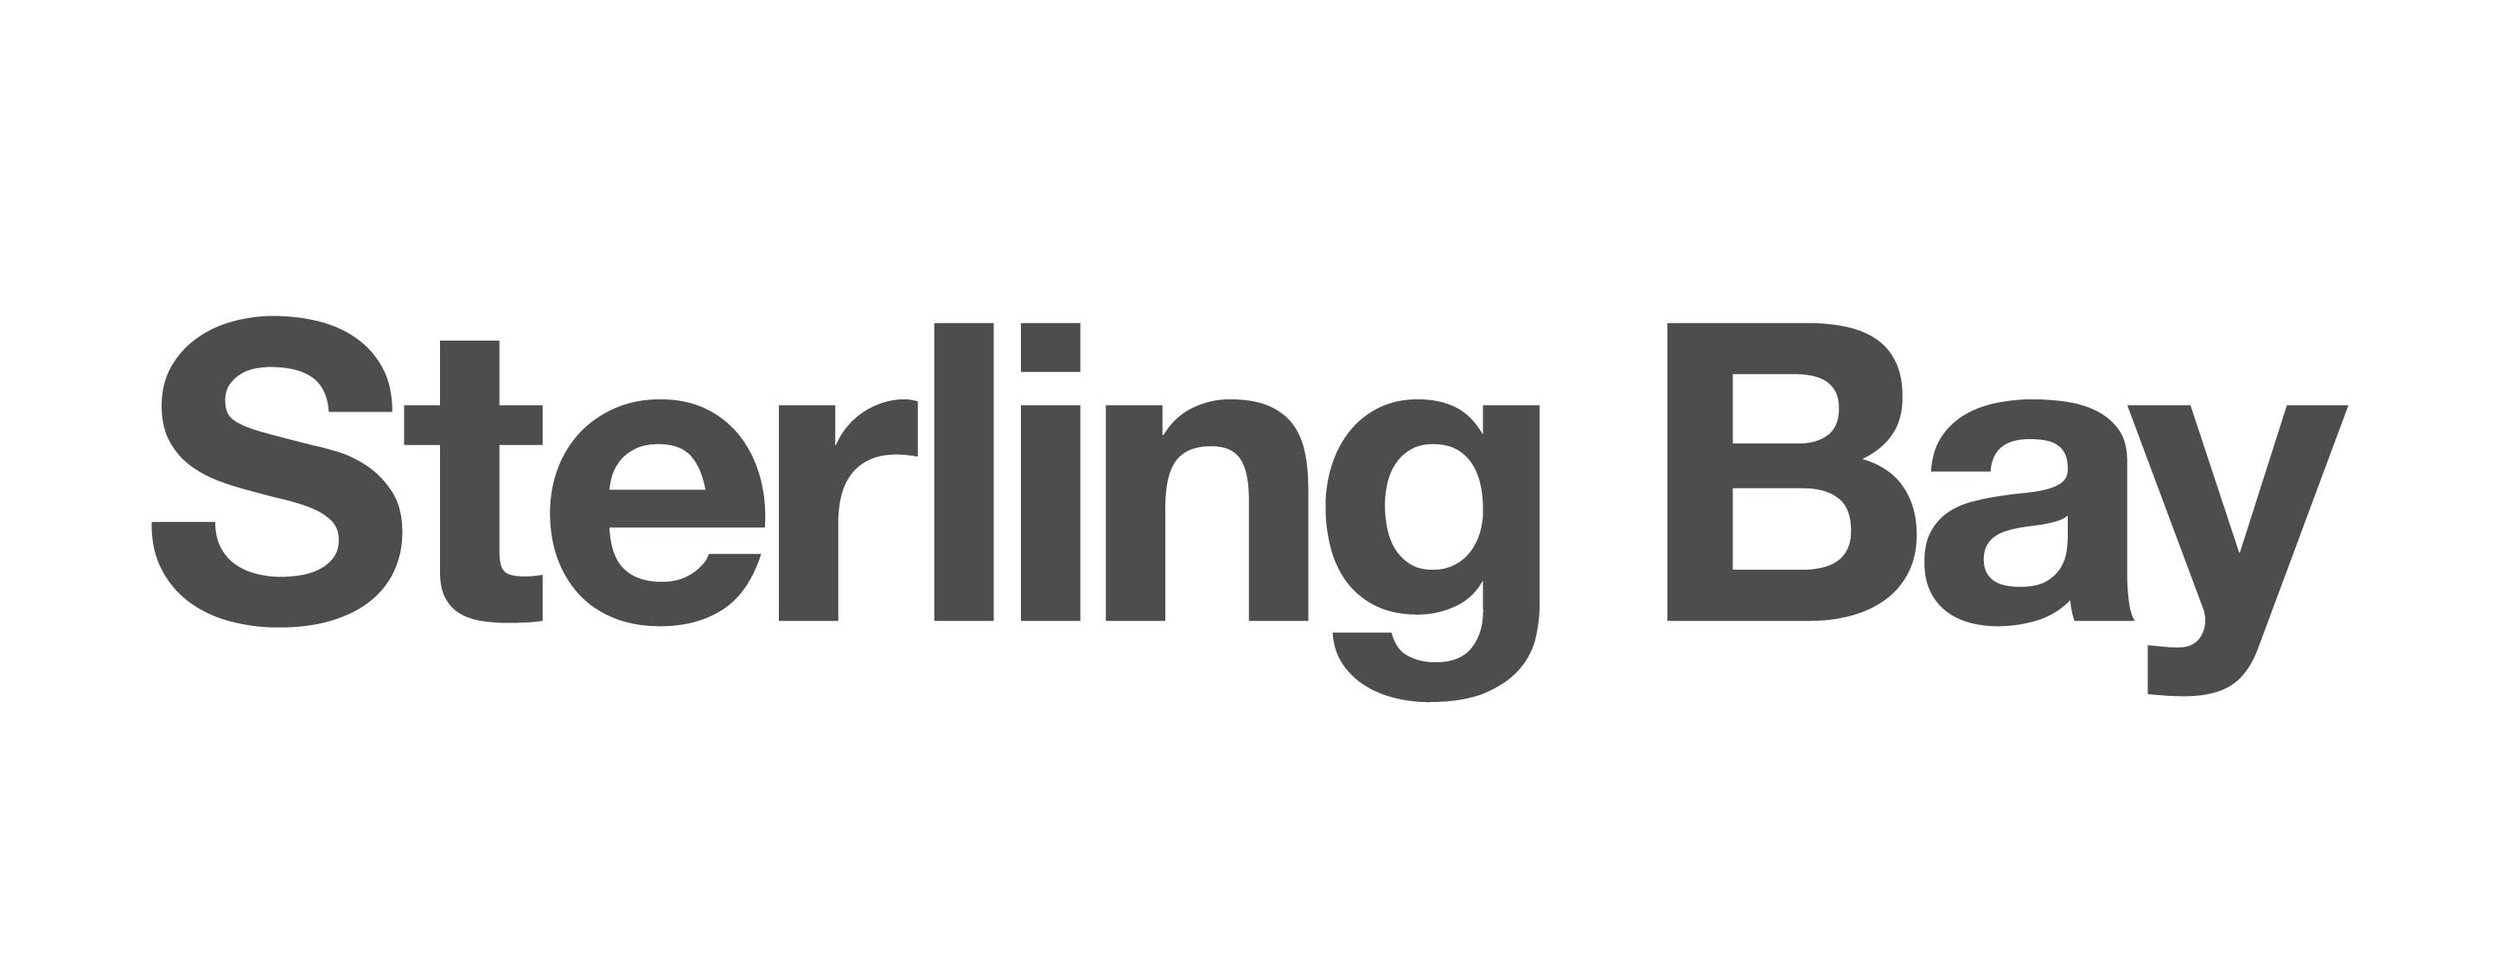 SB_Type_Helvetica.jpg